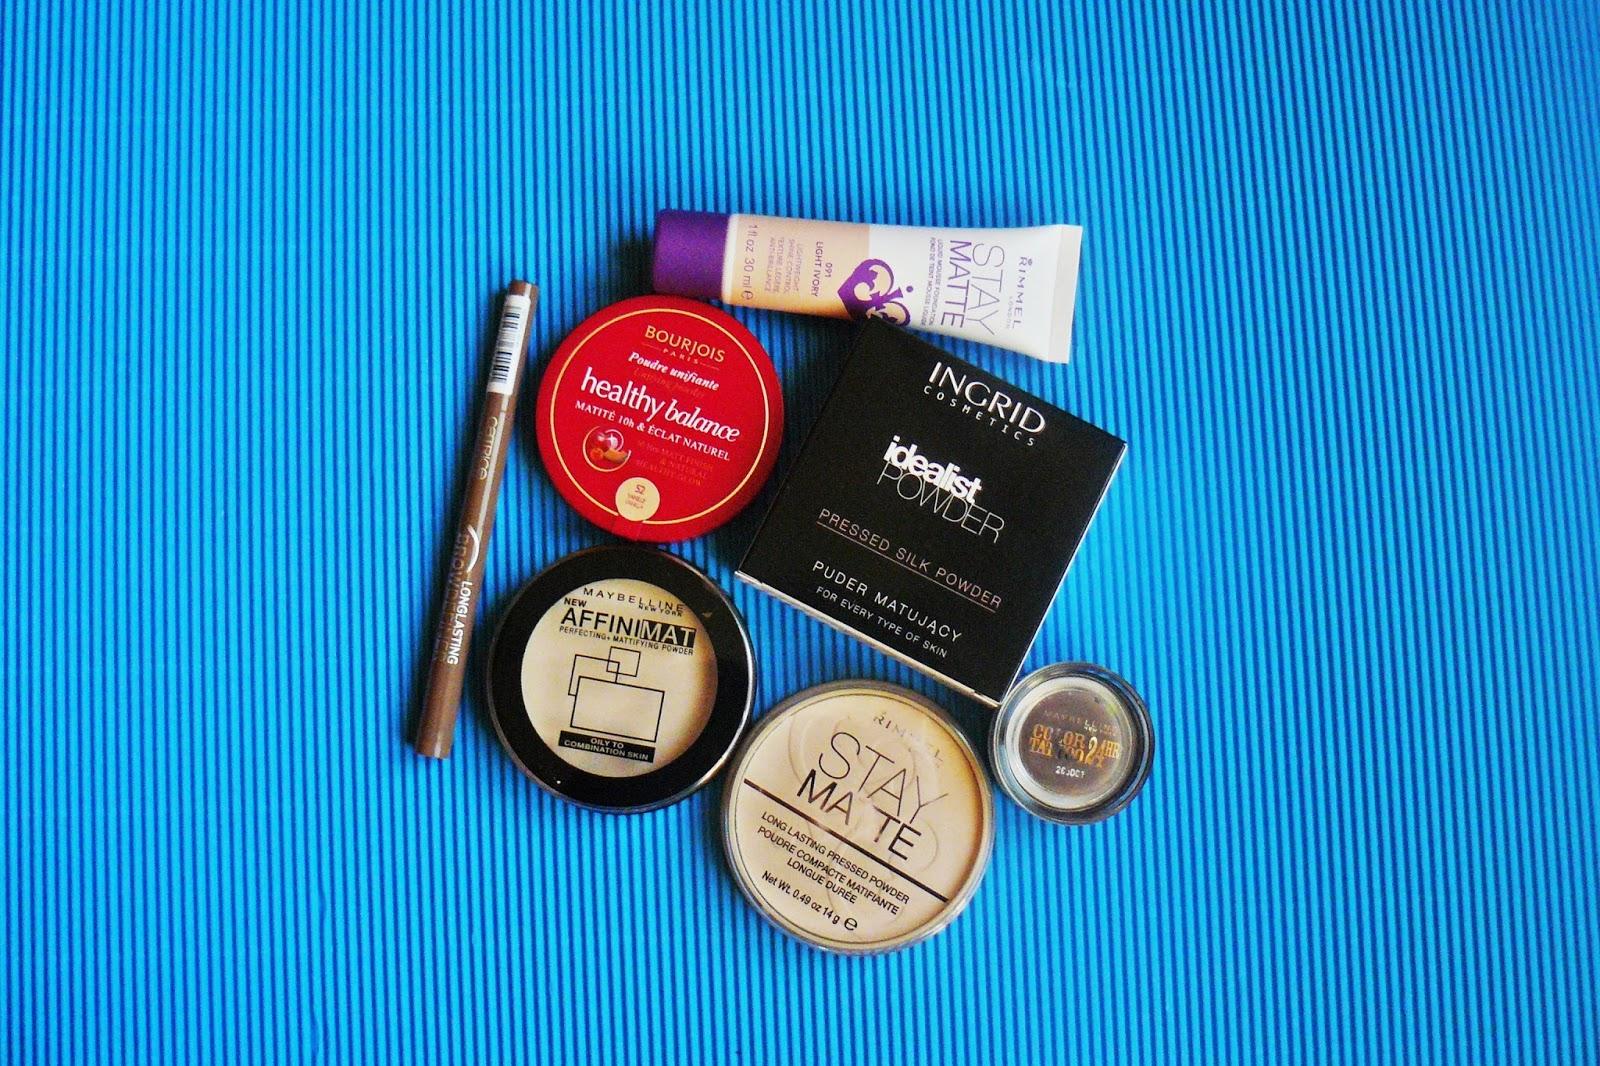 kosmetyki rossman makeup